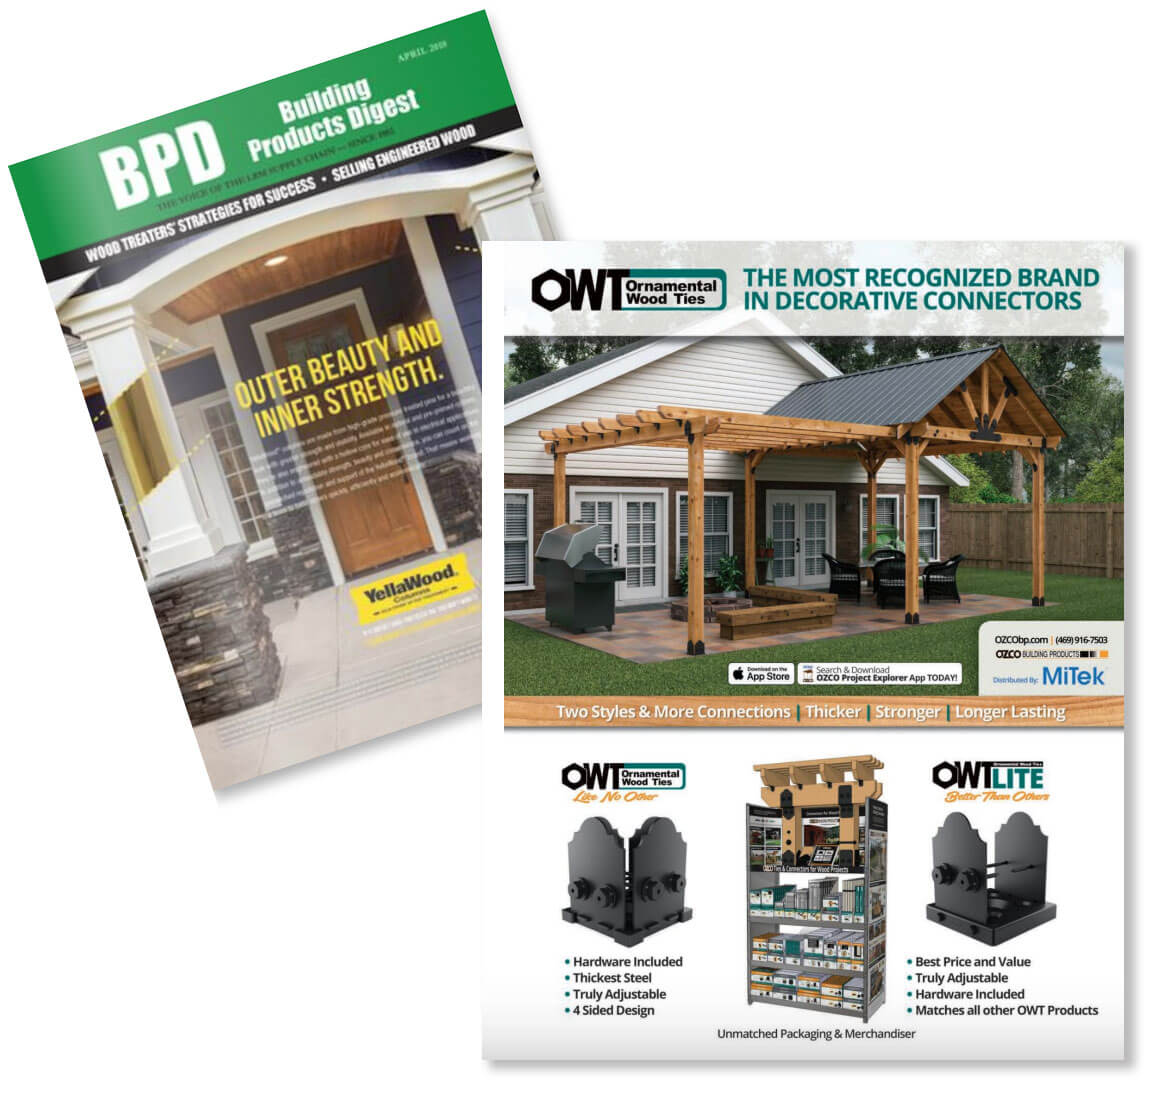 Building Products Digest (BPD) April 2018